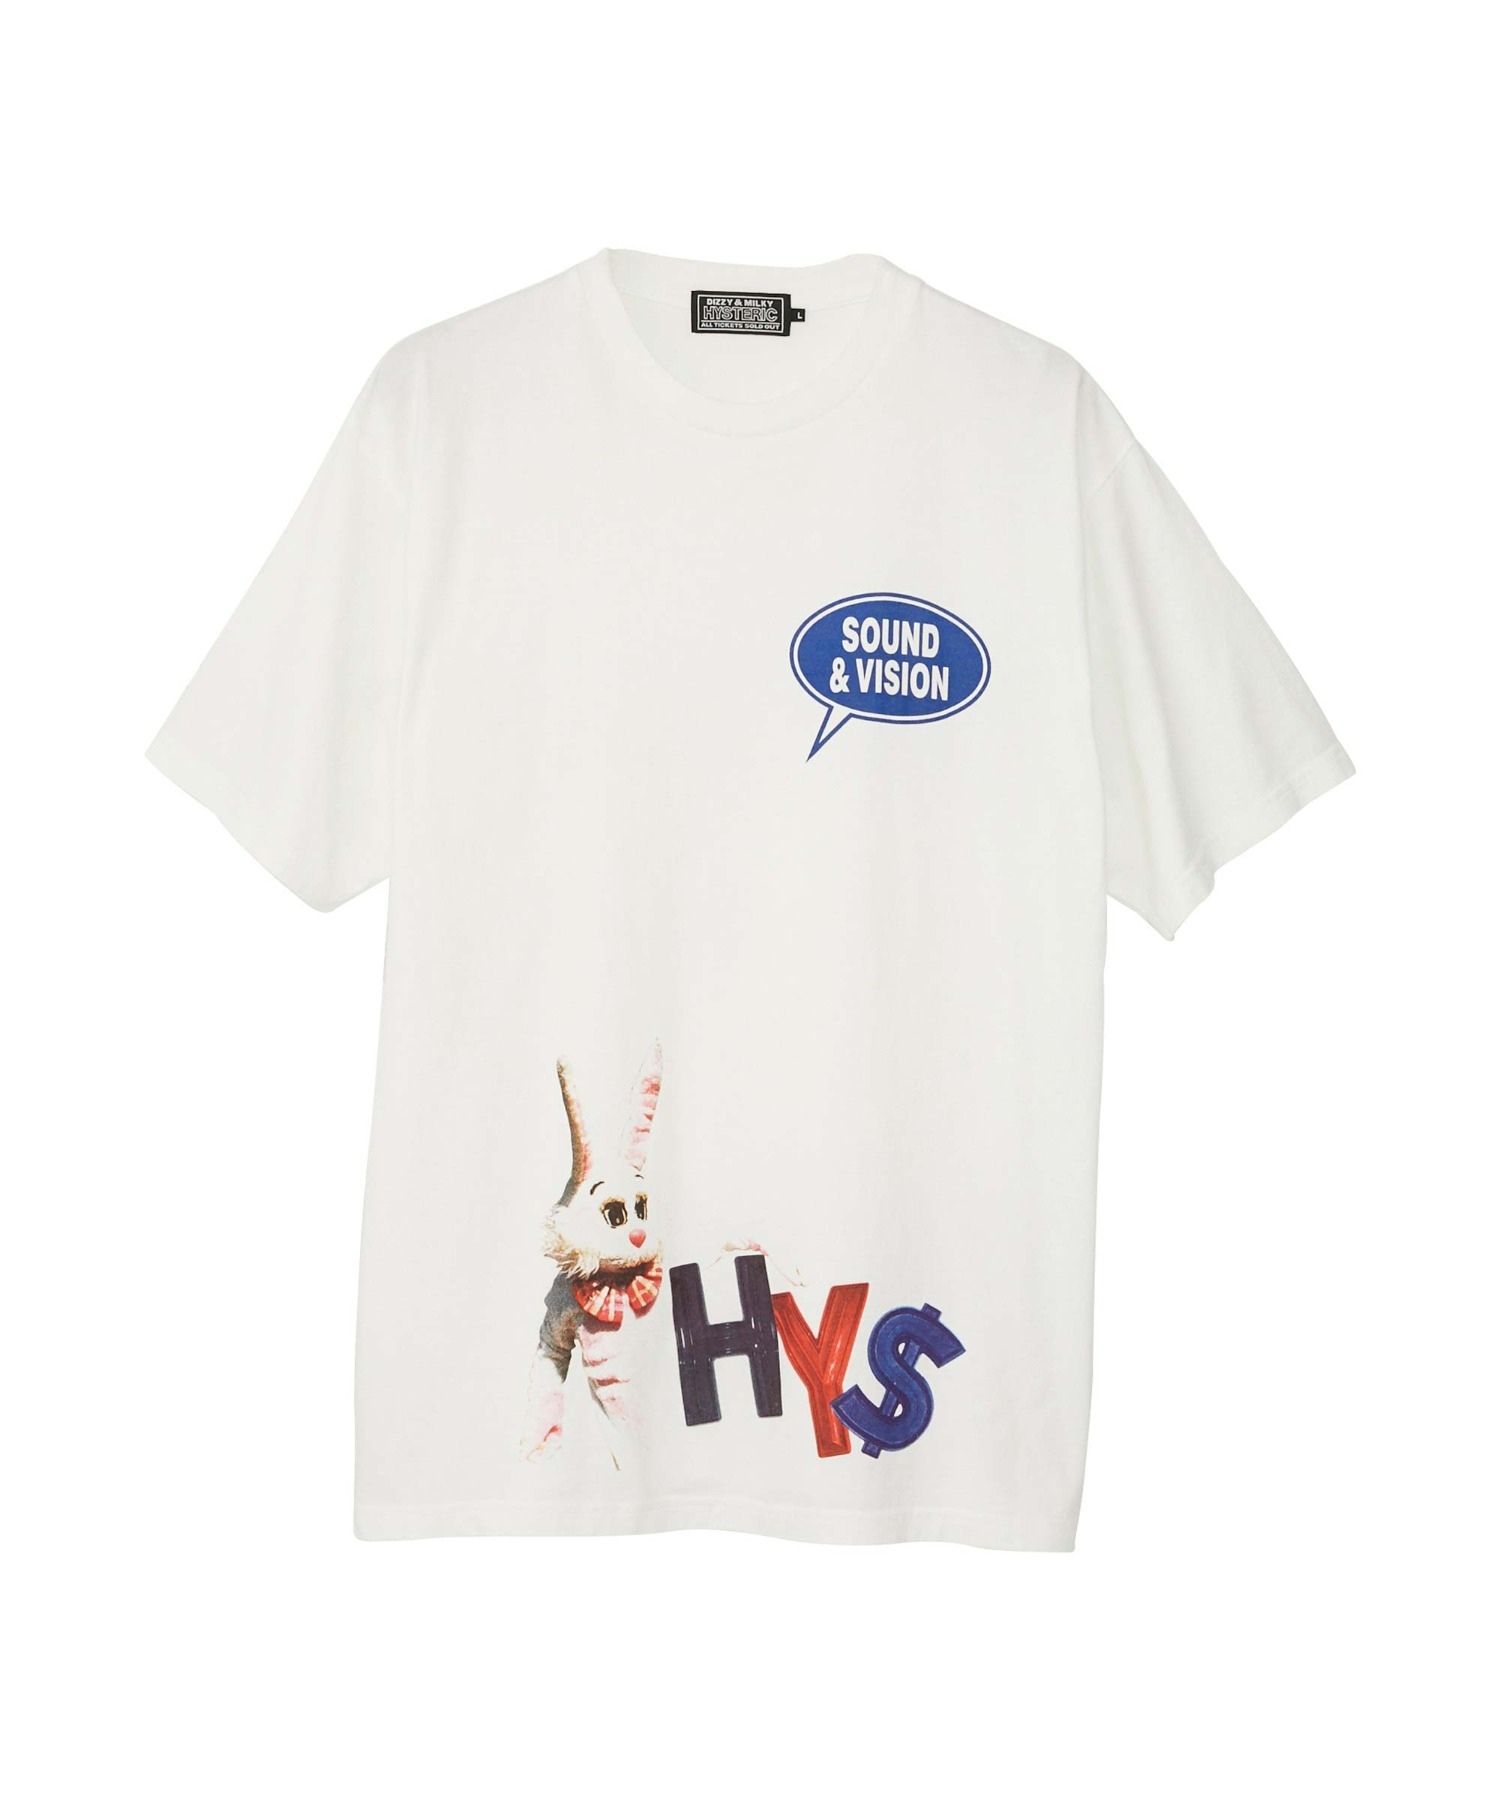 SOUND&VISION Tシャツ